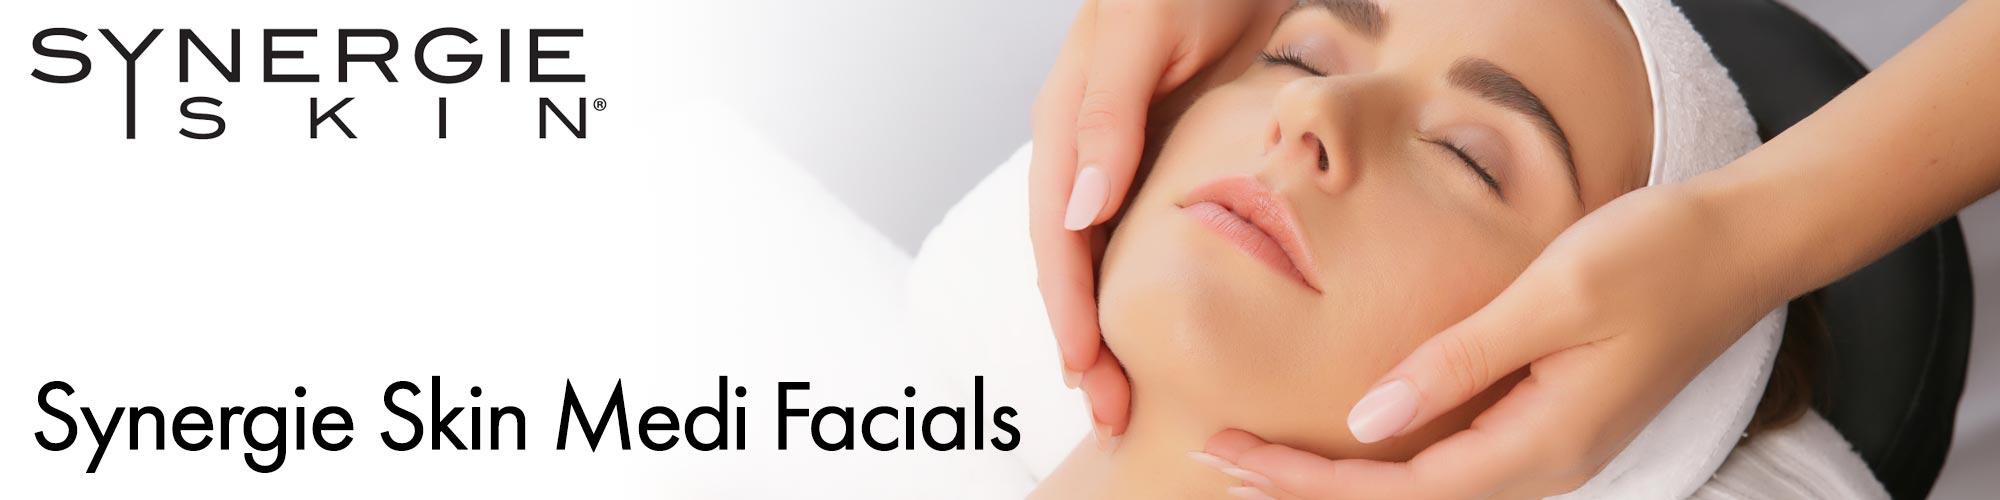 Syngerie Skin Medi Facials